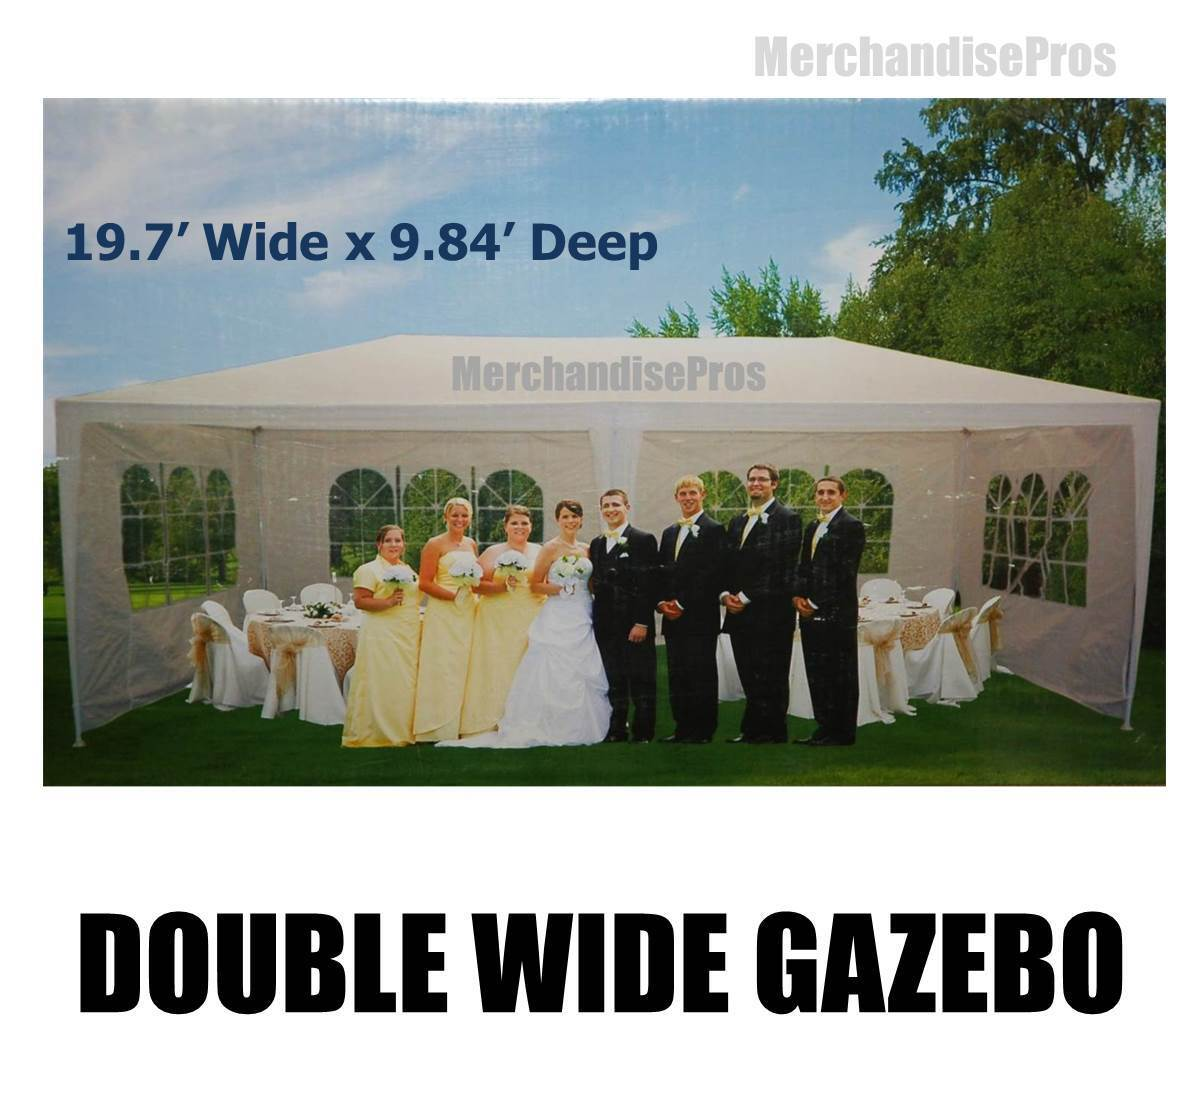 19 FT CANOPY DOUBLE WIDE GAZEBO SUN SUN GAZEBO SHELTER W/STEEL FRAME ASSEMBLY REQUIROT NEW 850dc9